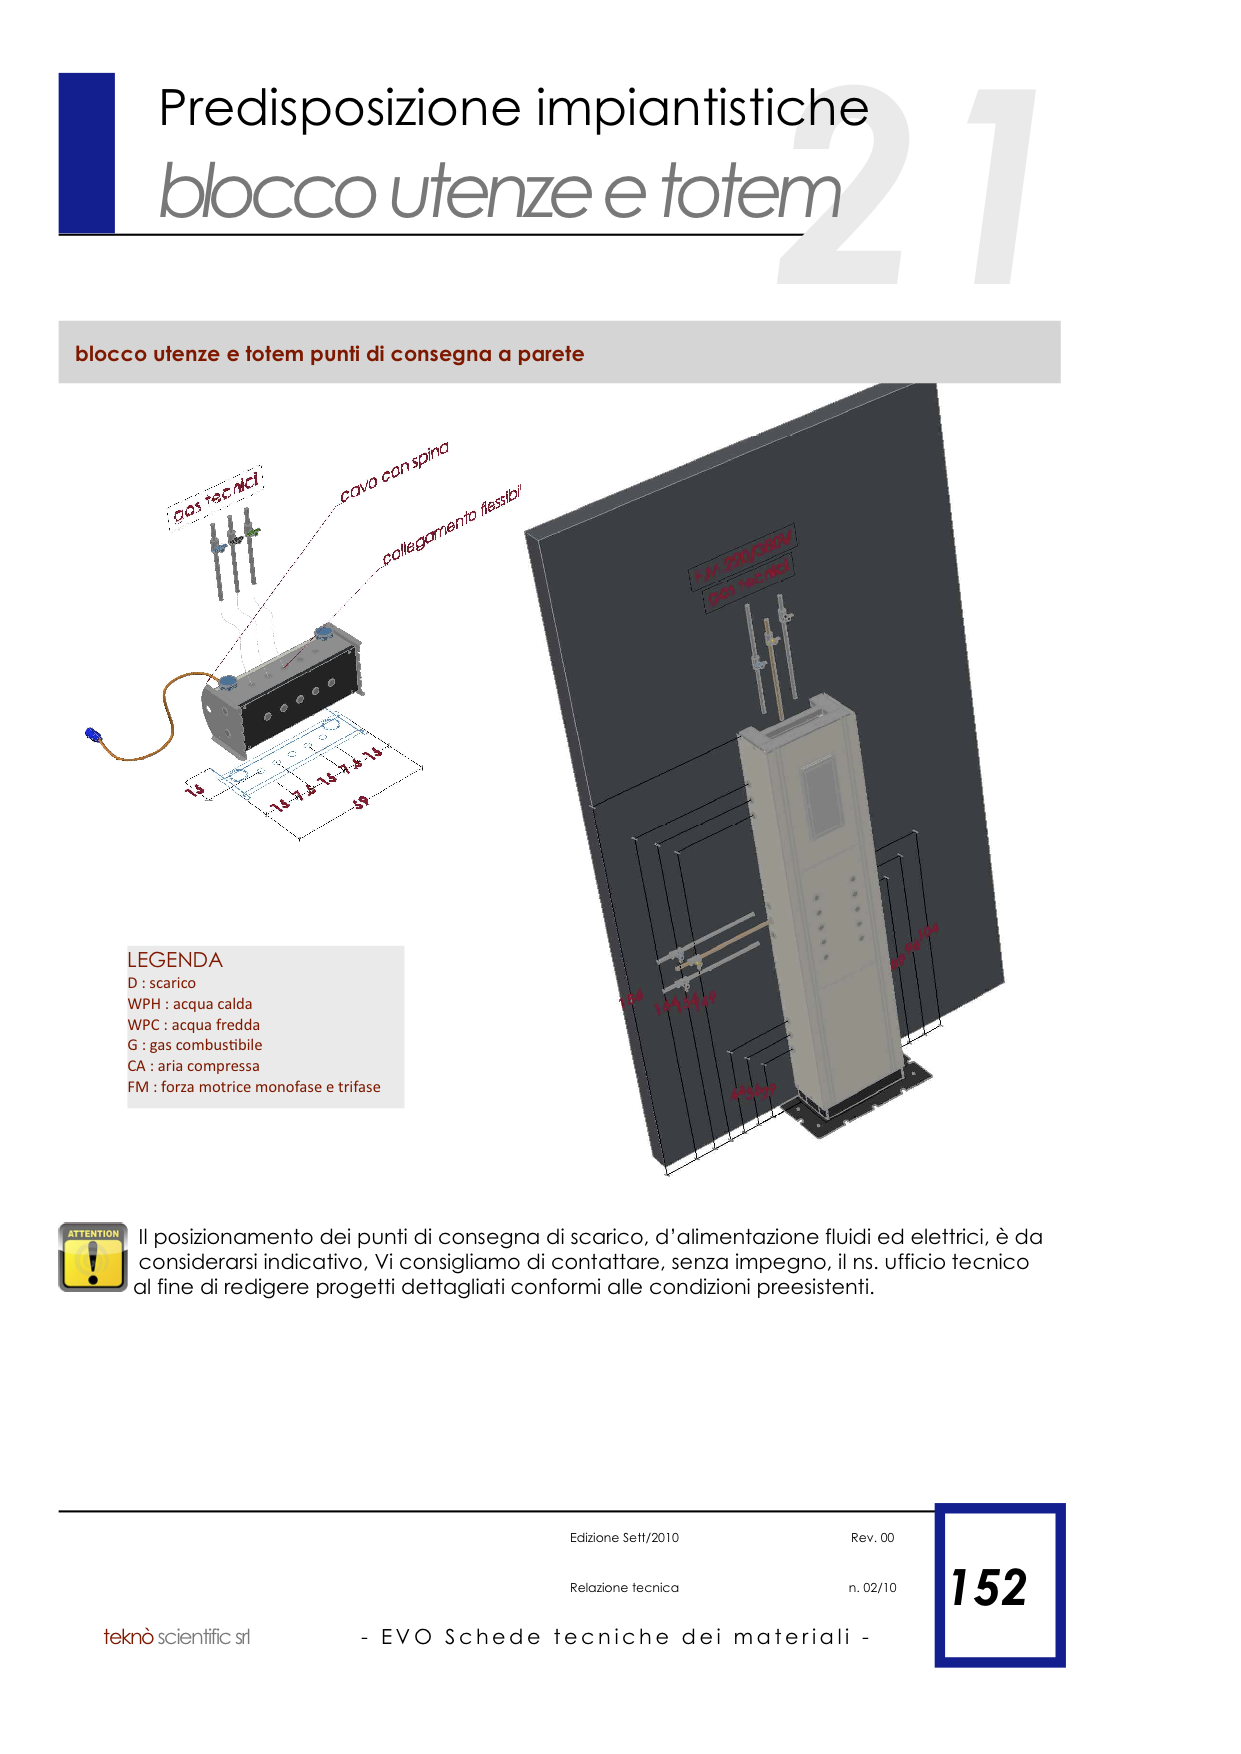 EVO Schede Tecniche materiali copia 12.png